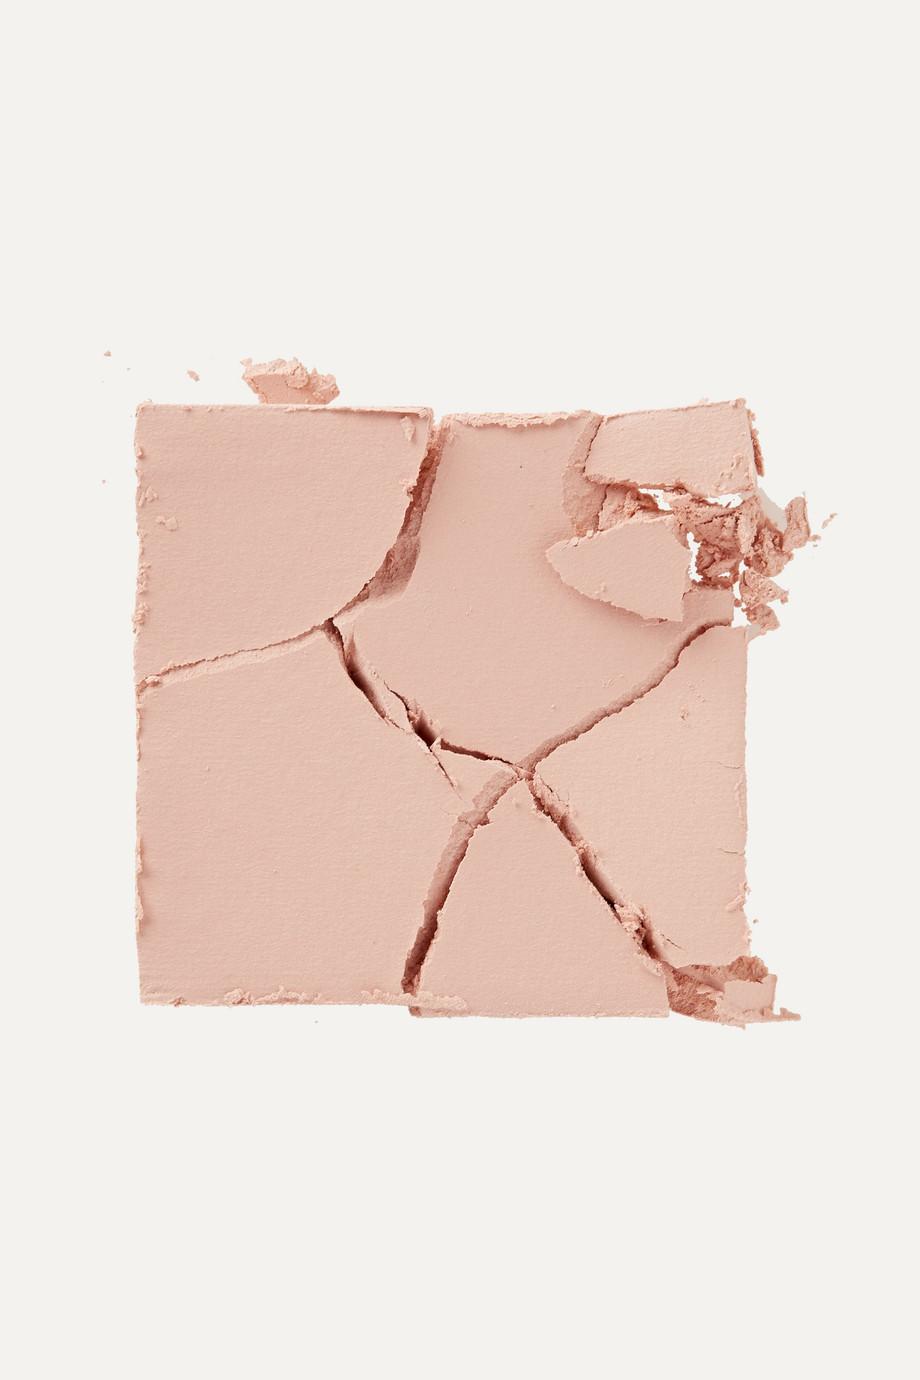 Serge Lutens Finishing Powder – Pink – Puder